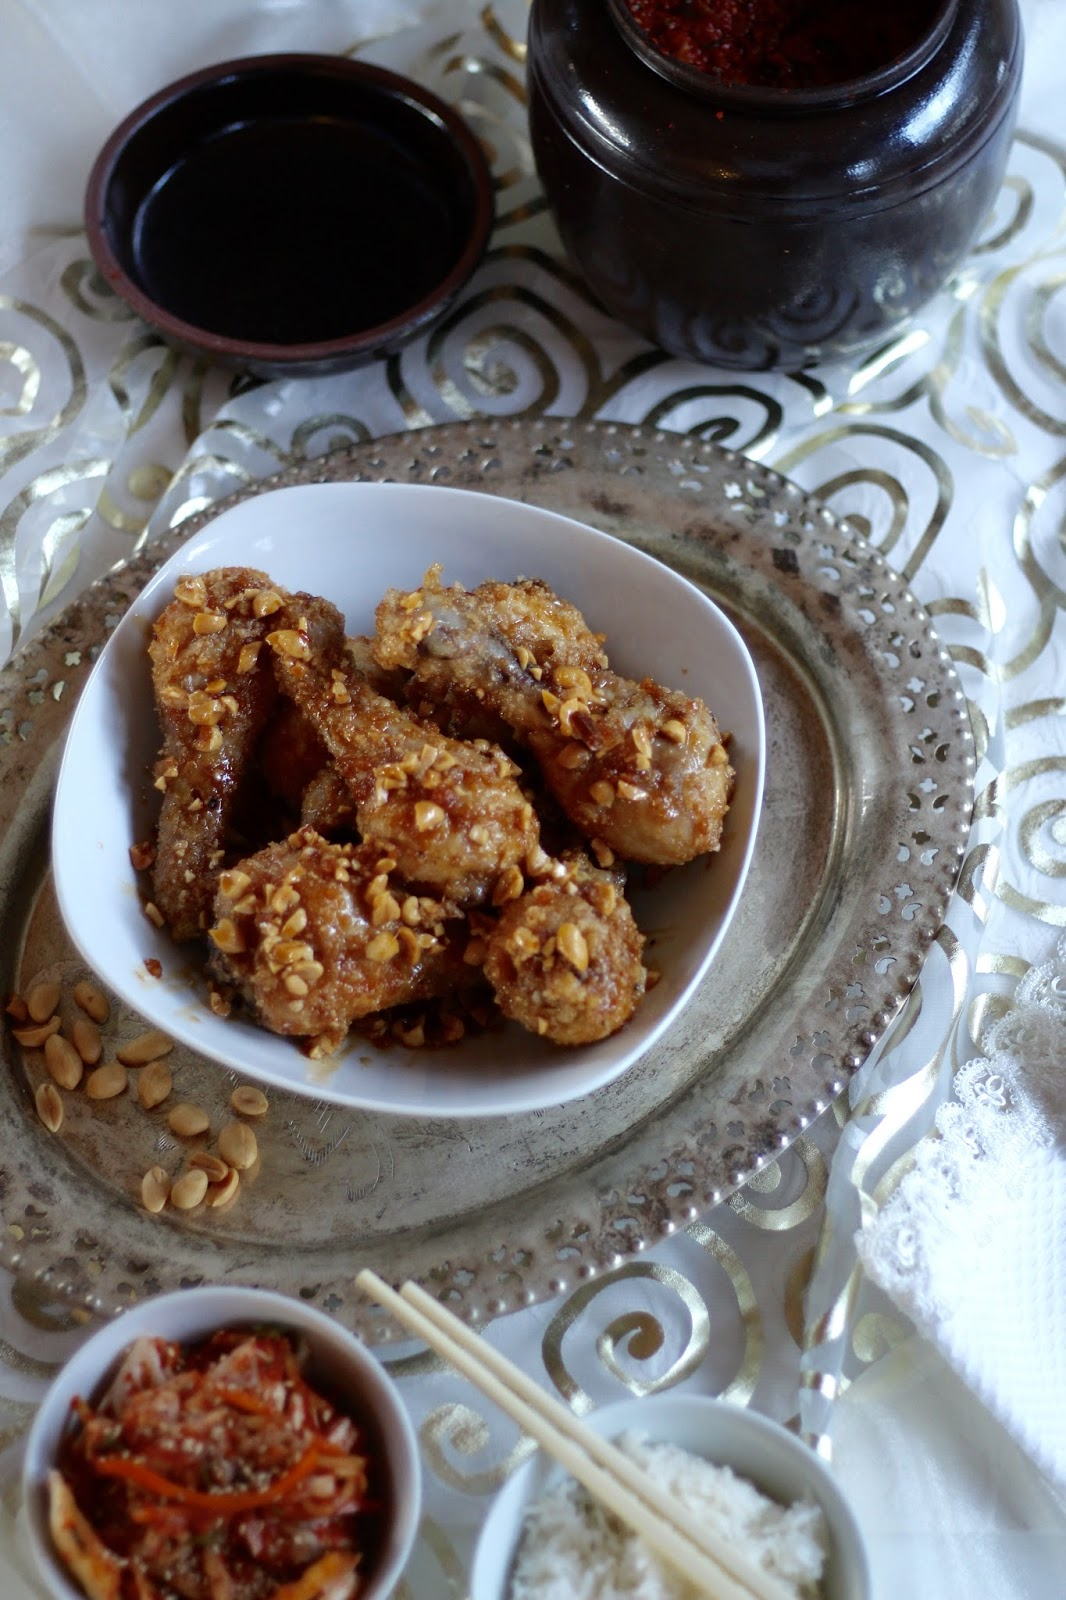 Knusprige frittierte Hähnchenschenkel  - Koreanisches Dakgangjeong nach Maangchi